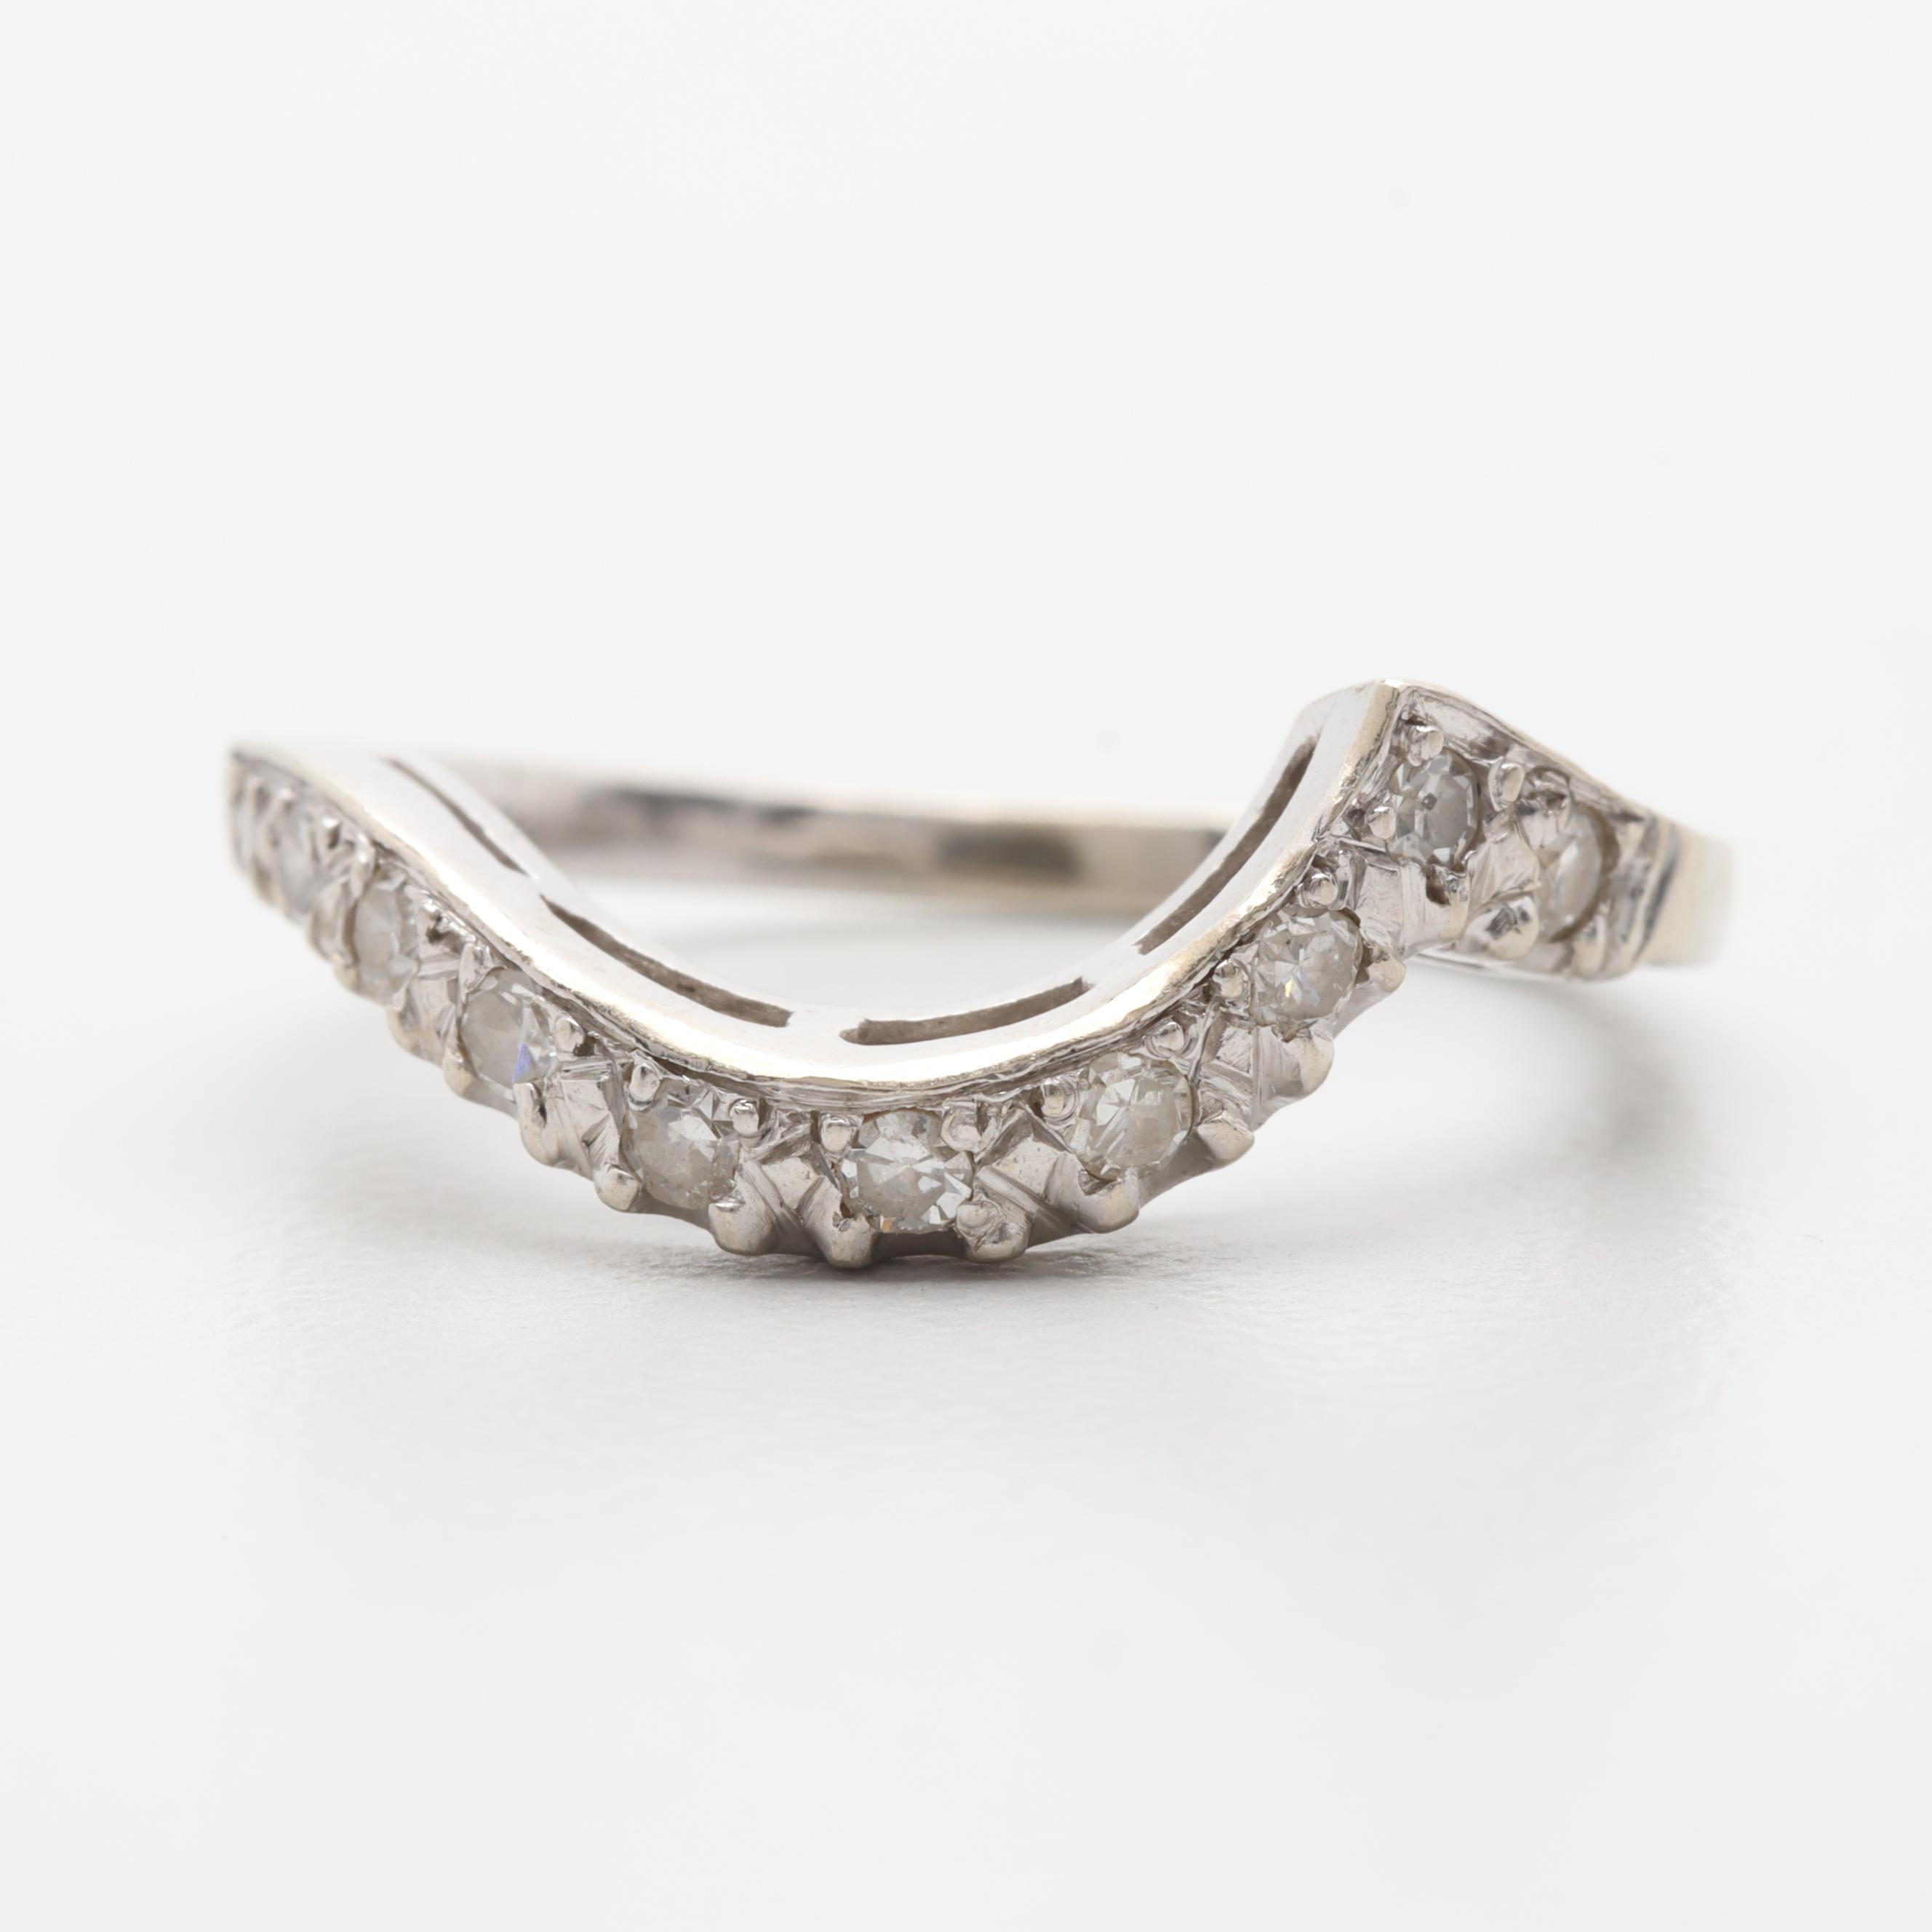 14K White Gold Diamond Freeform Ring